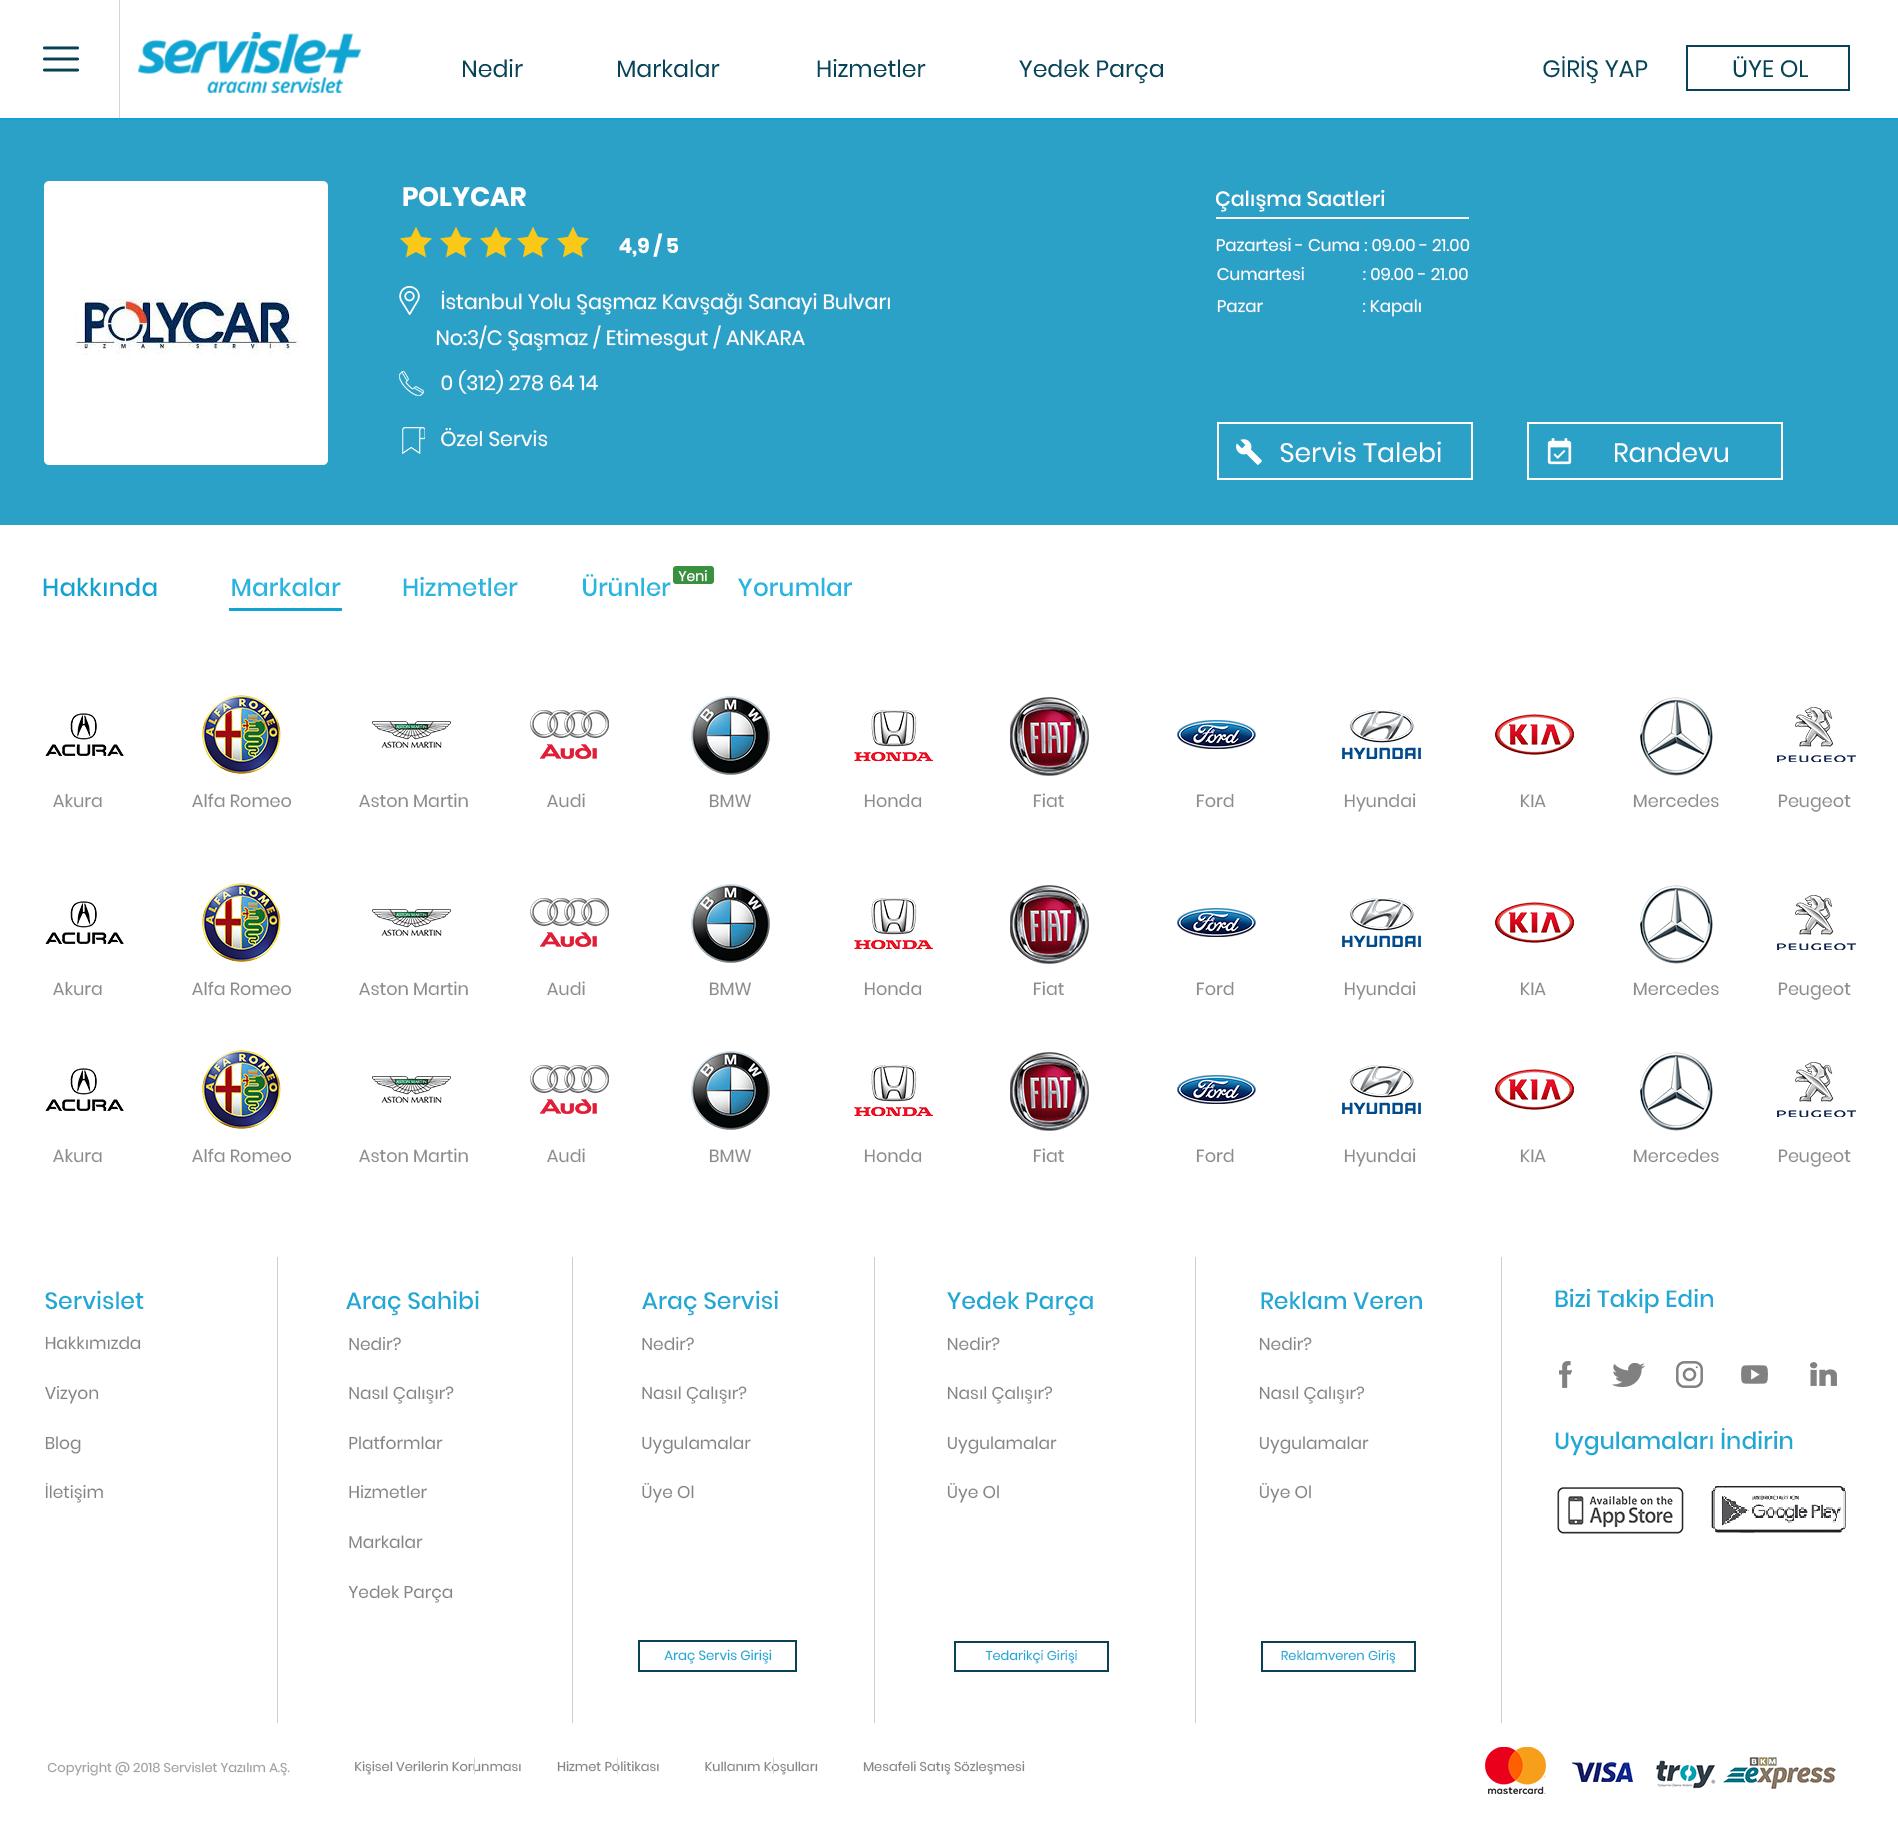 Araç Servisi Profili